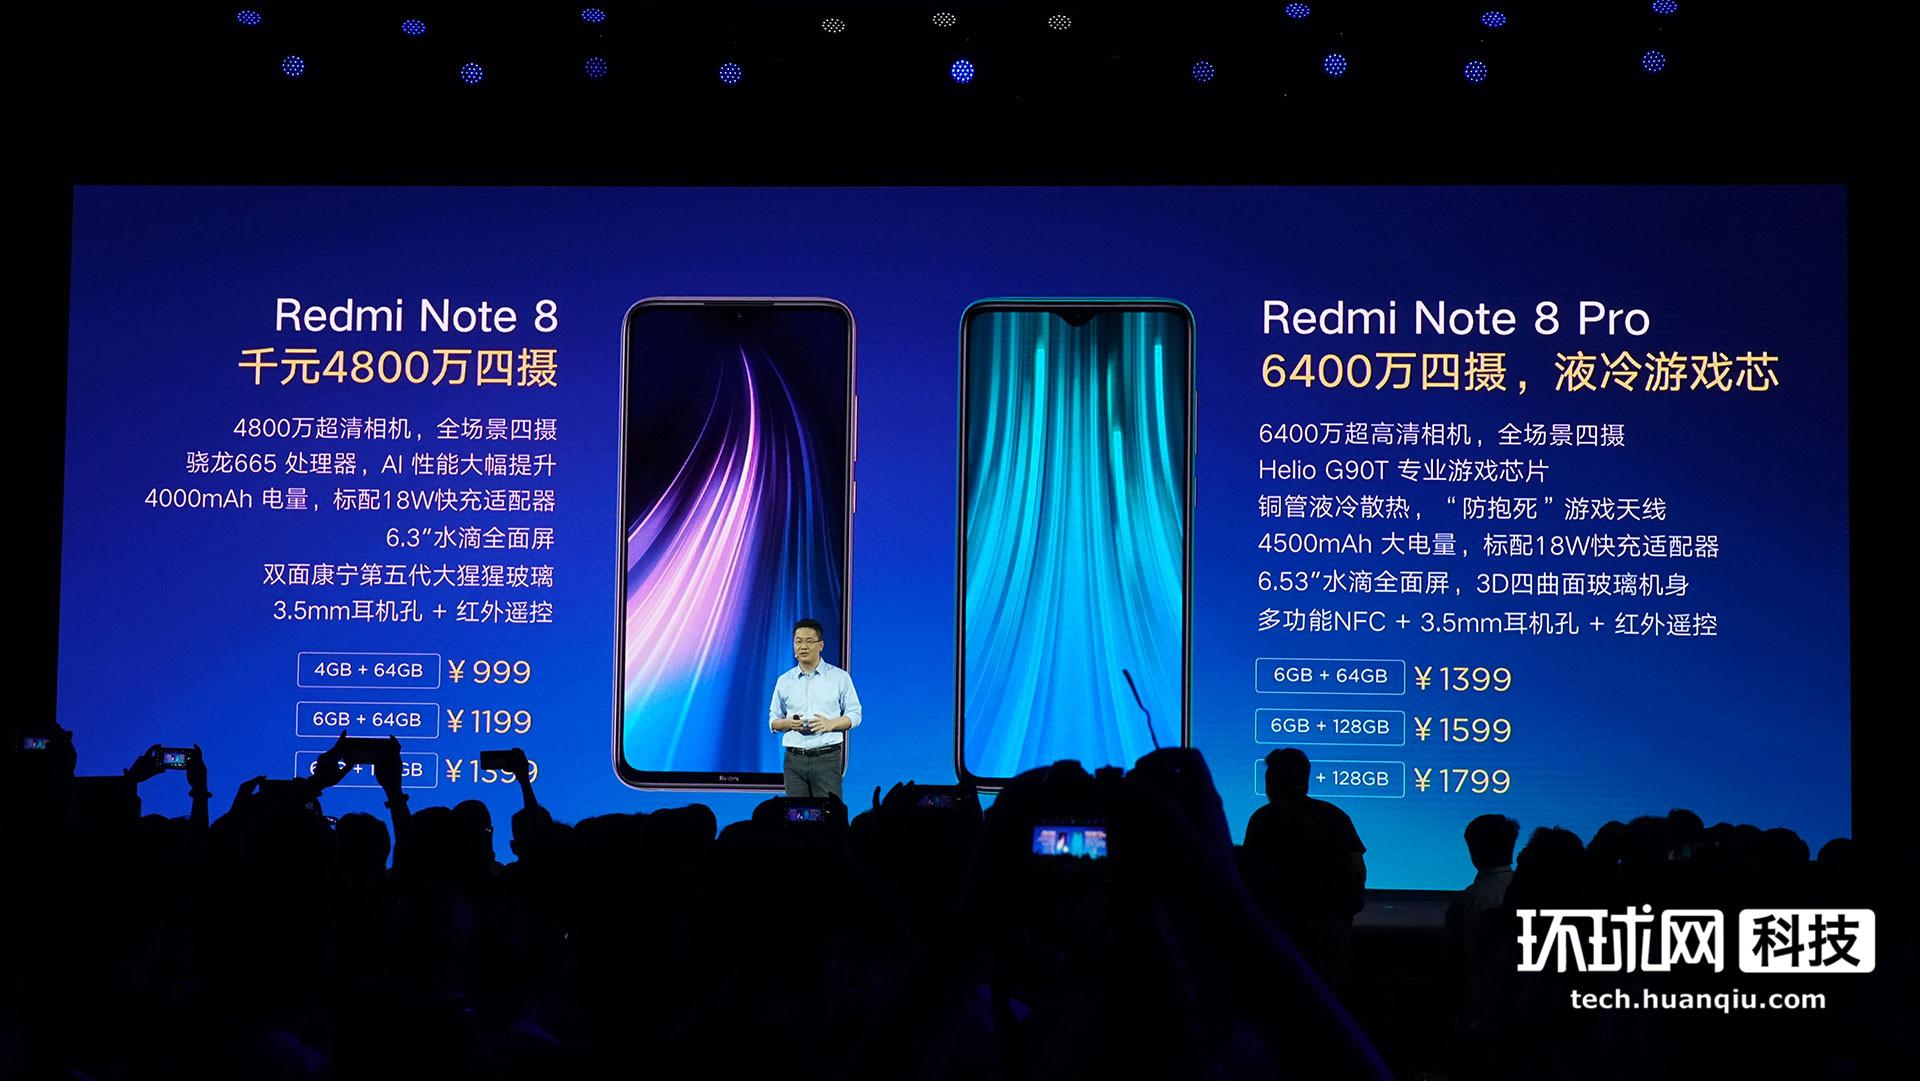 Redmi Note8系列发布:普及四摄、NFC、6400万像素